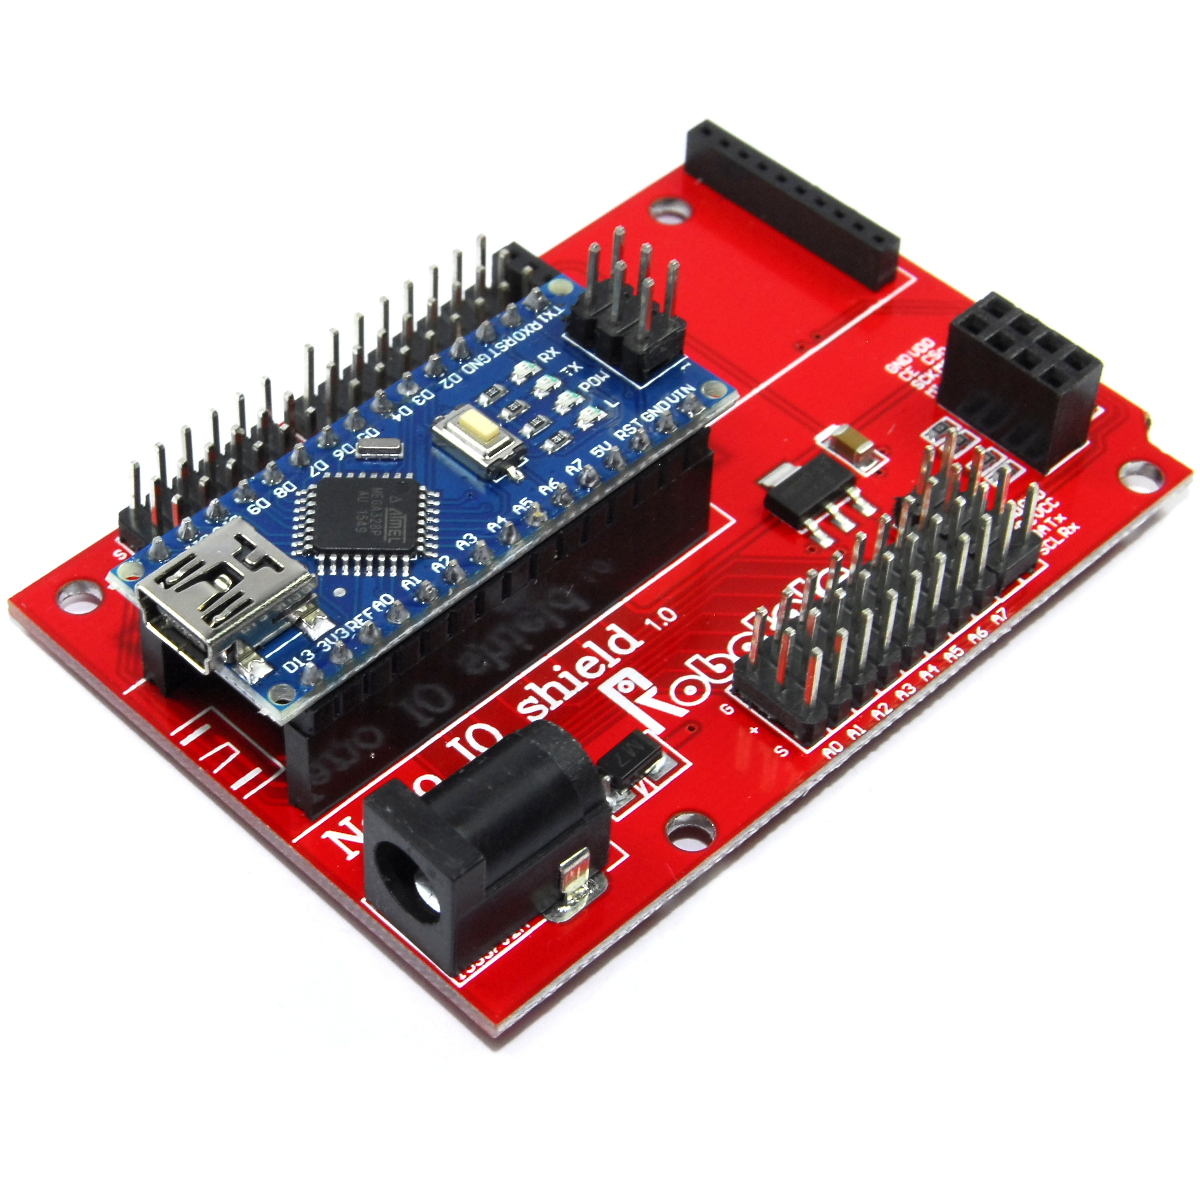 Arduino NANO Breakout Shield Sensor V3 DUEMILANOVE UNO Funduino Flux Workshop